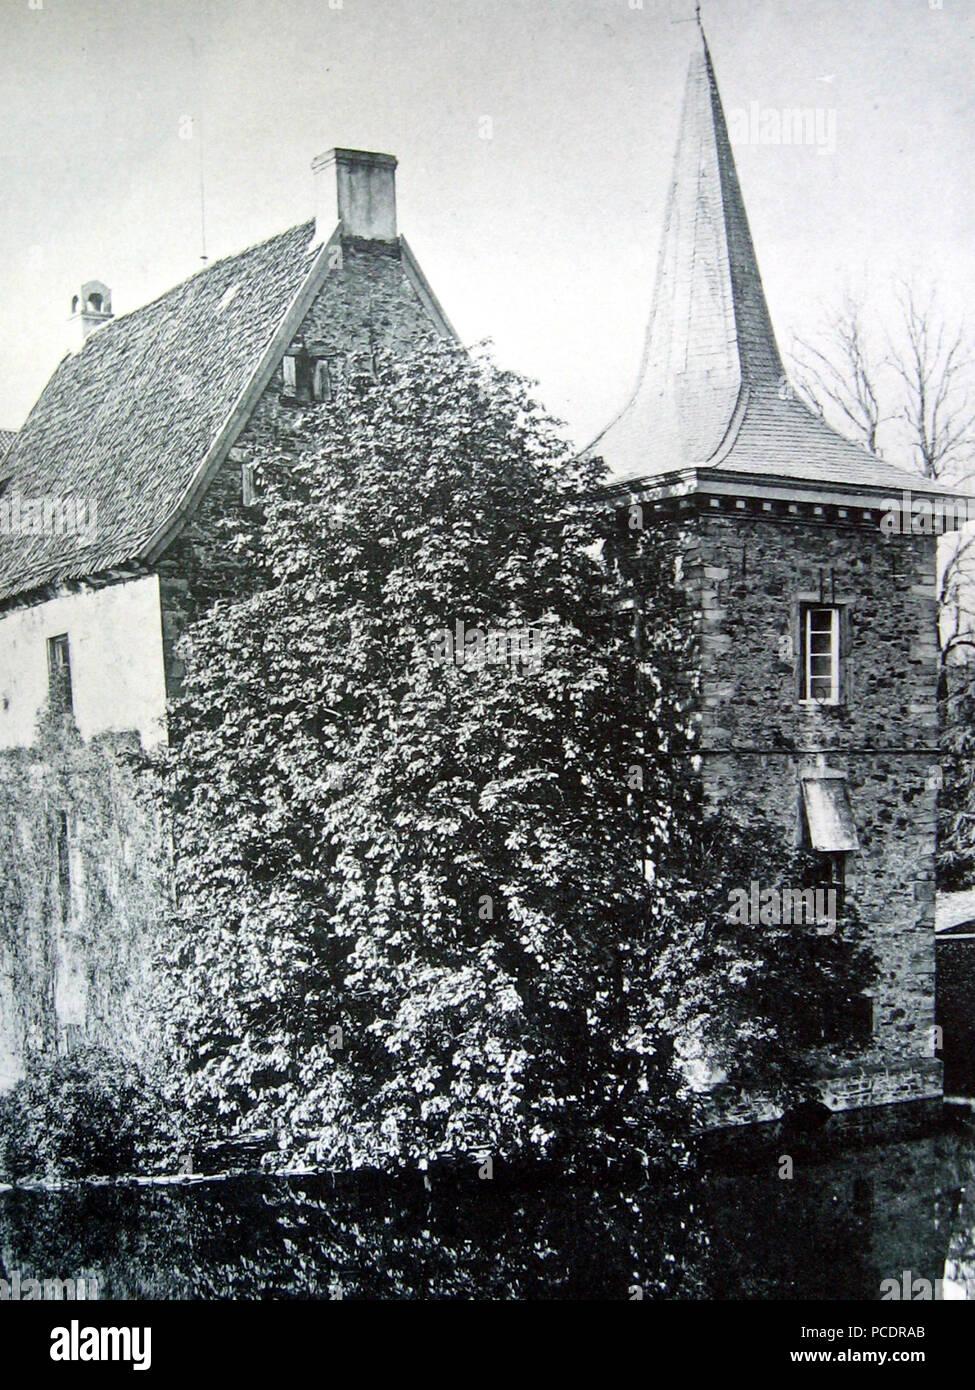 45 IMG 2584-Rittergut-Romber-Hauptgebaeude-Suedost-1894 - Stock Image